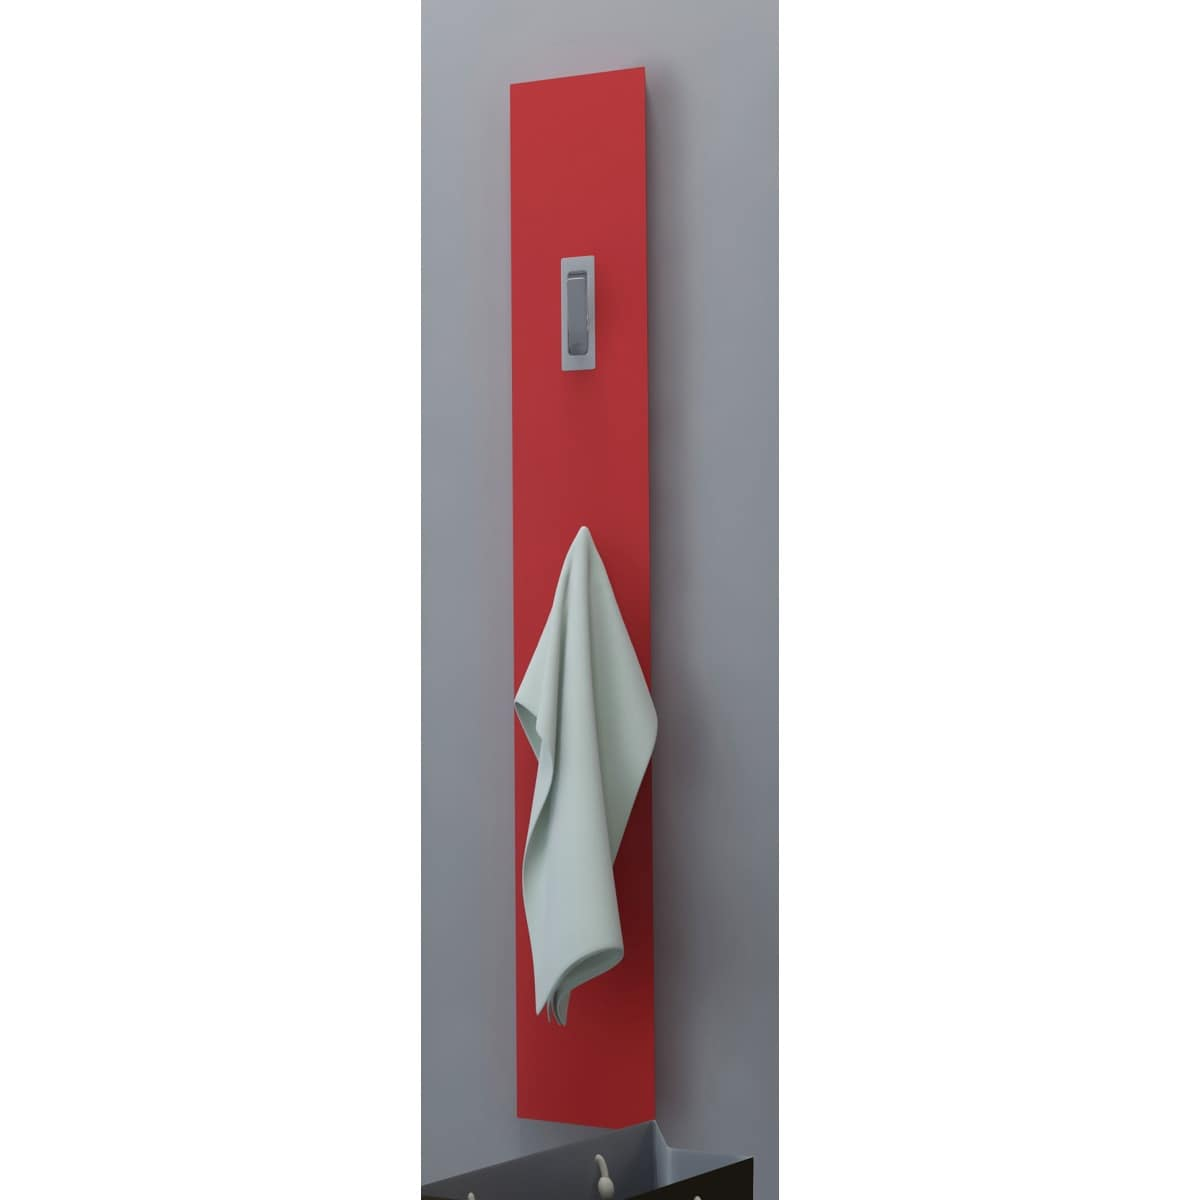 Paneel rot hochglanz lackiert ca 15 x 120 x 2 5 cm porta for Ecksofa porta